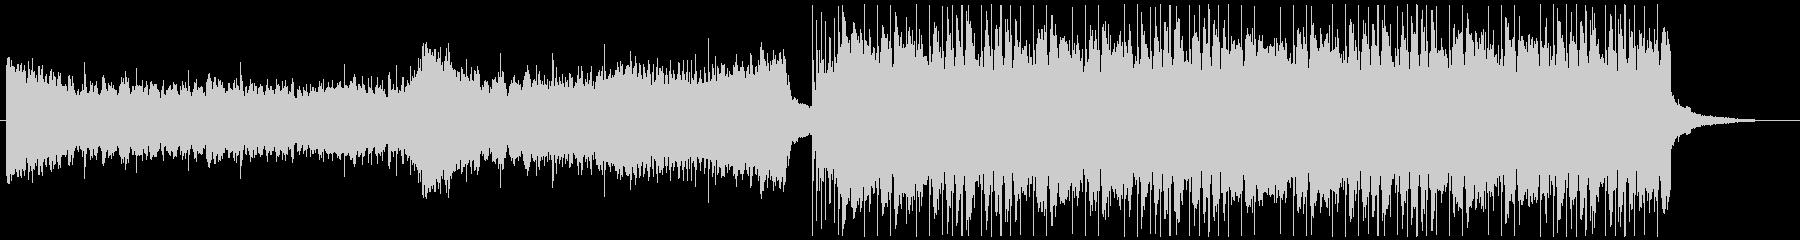 Colour Bass / insertの未再生の波形